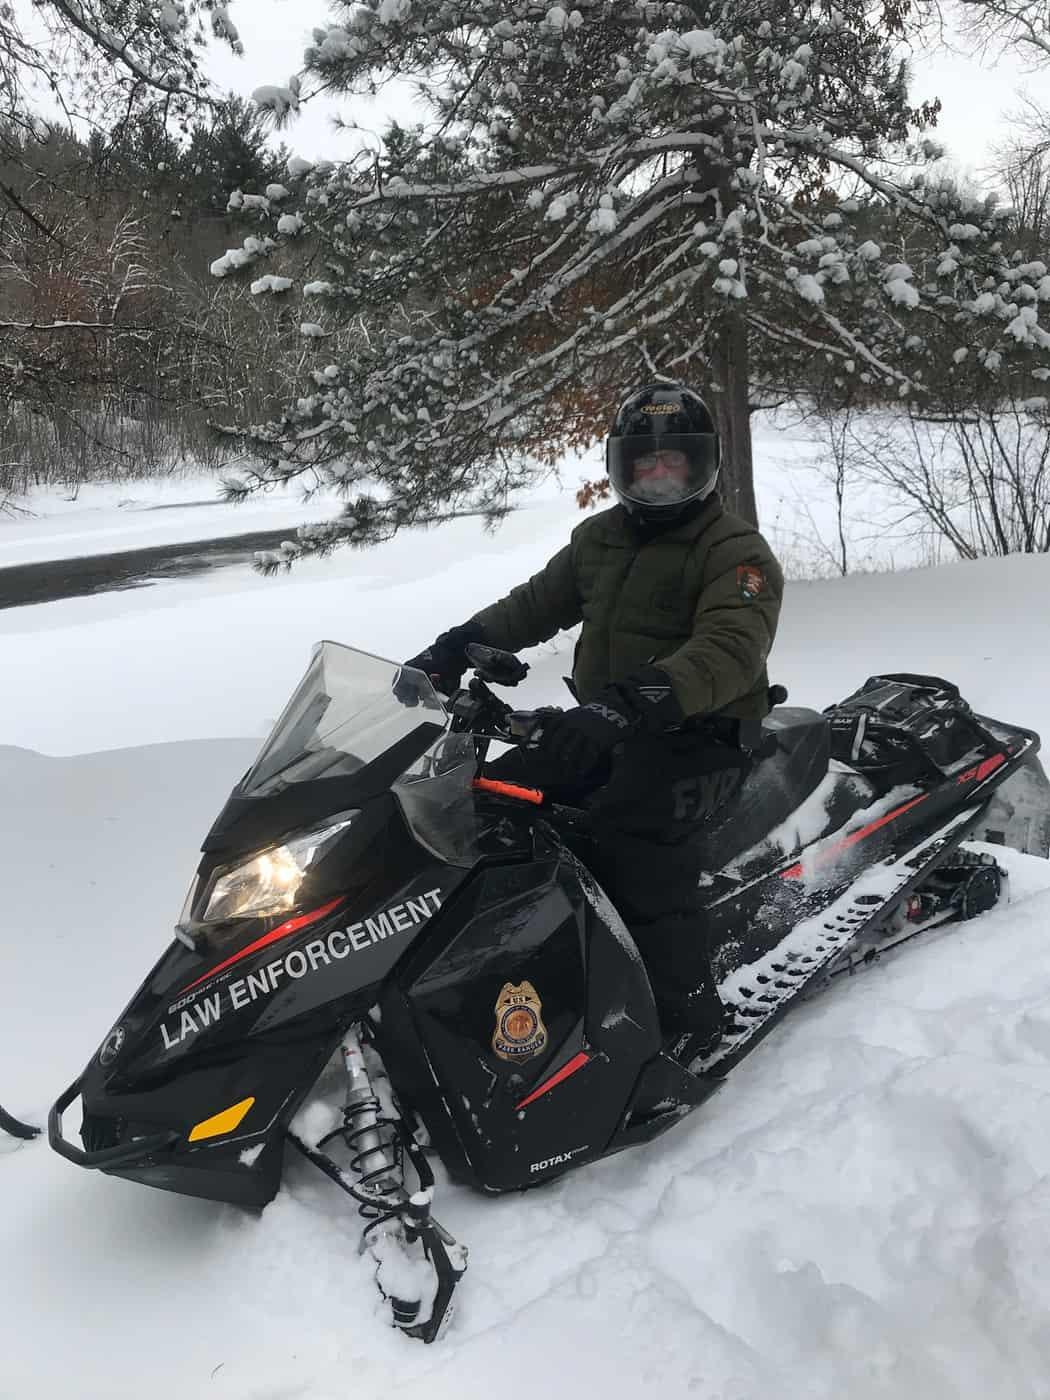 U.S. Park Ranger Charlie on snowmobile patrol. (Photo: NPS)